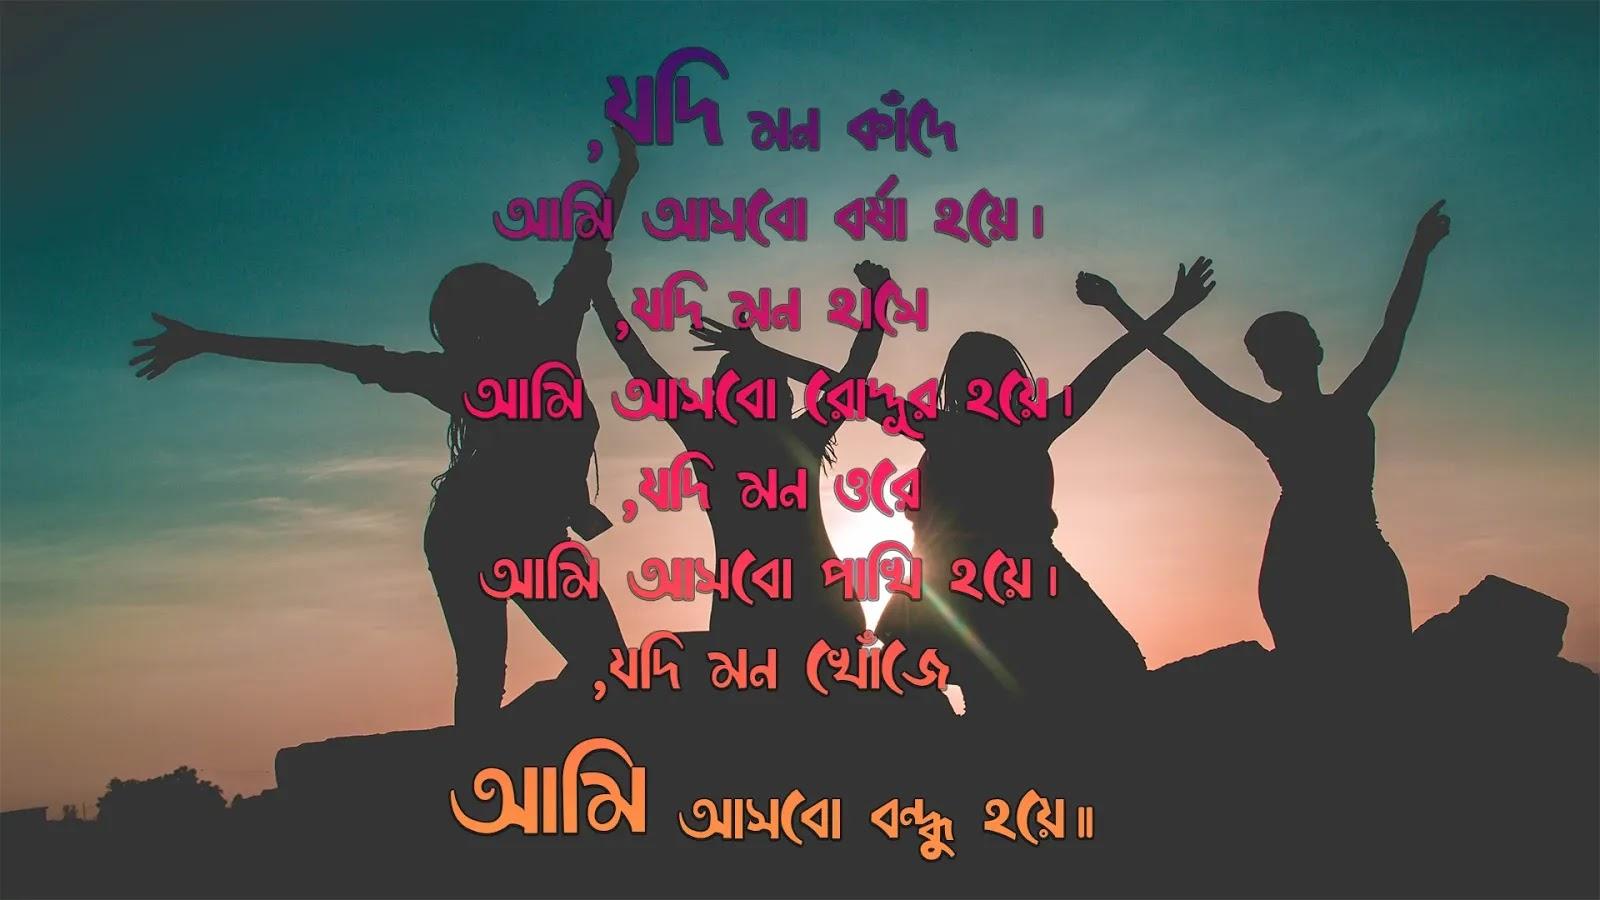 bangla sad quotes about life